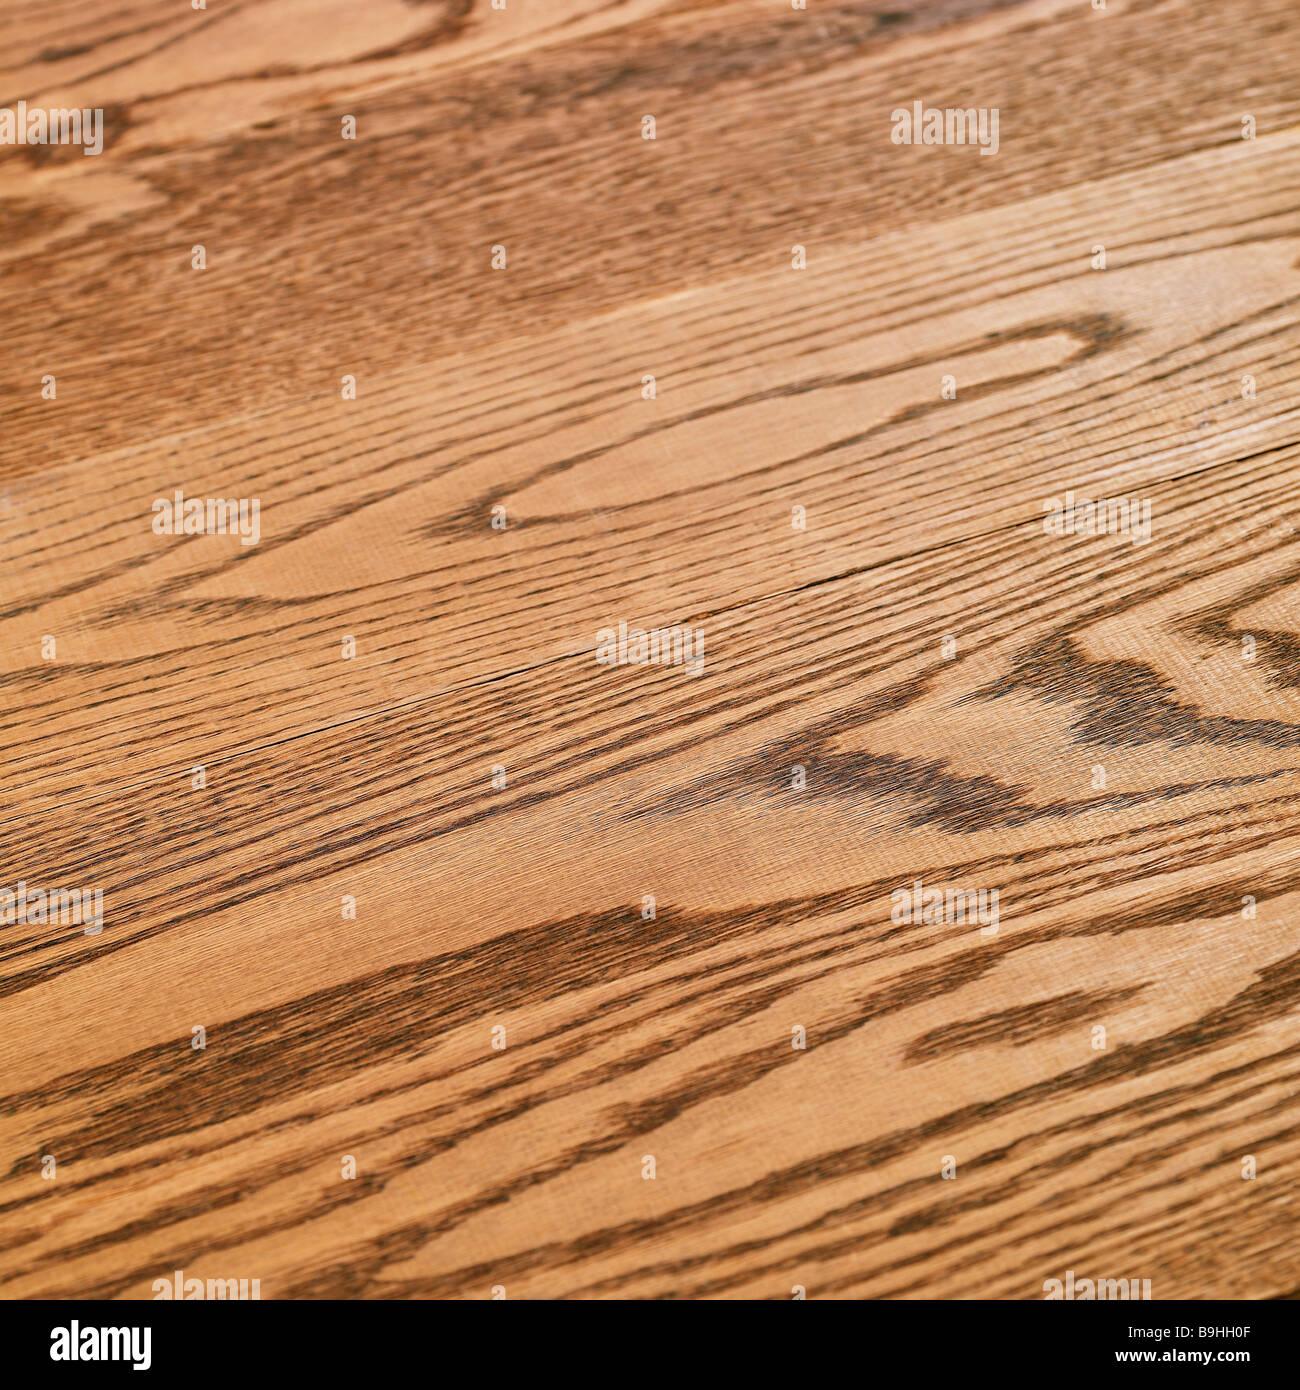 Superficie de la madera Imagen De Stock